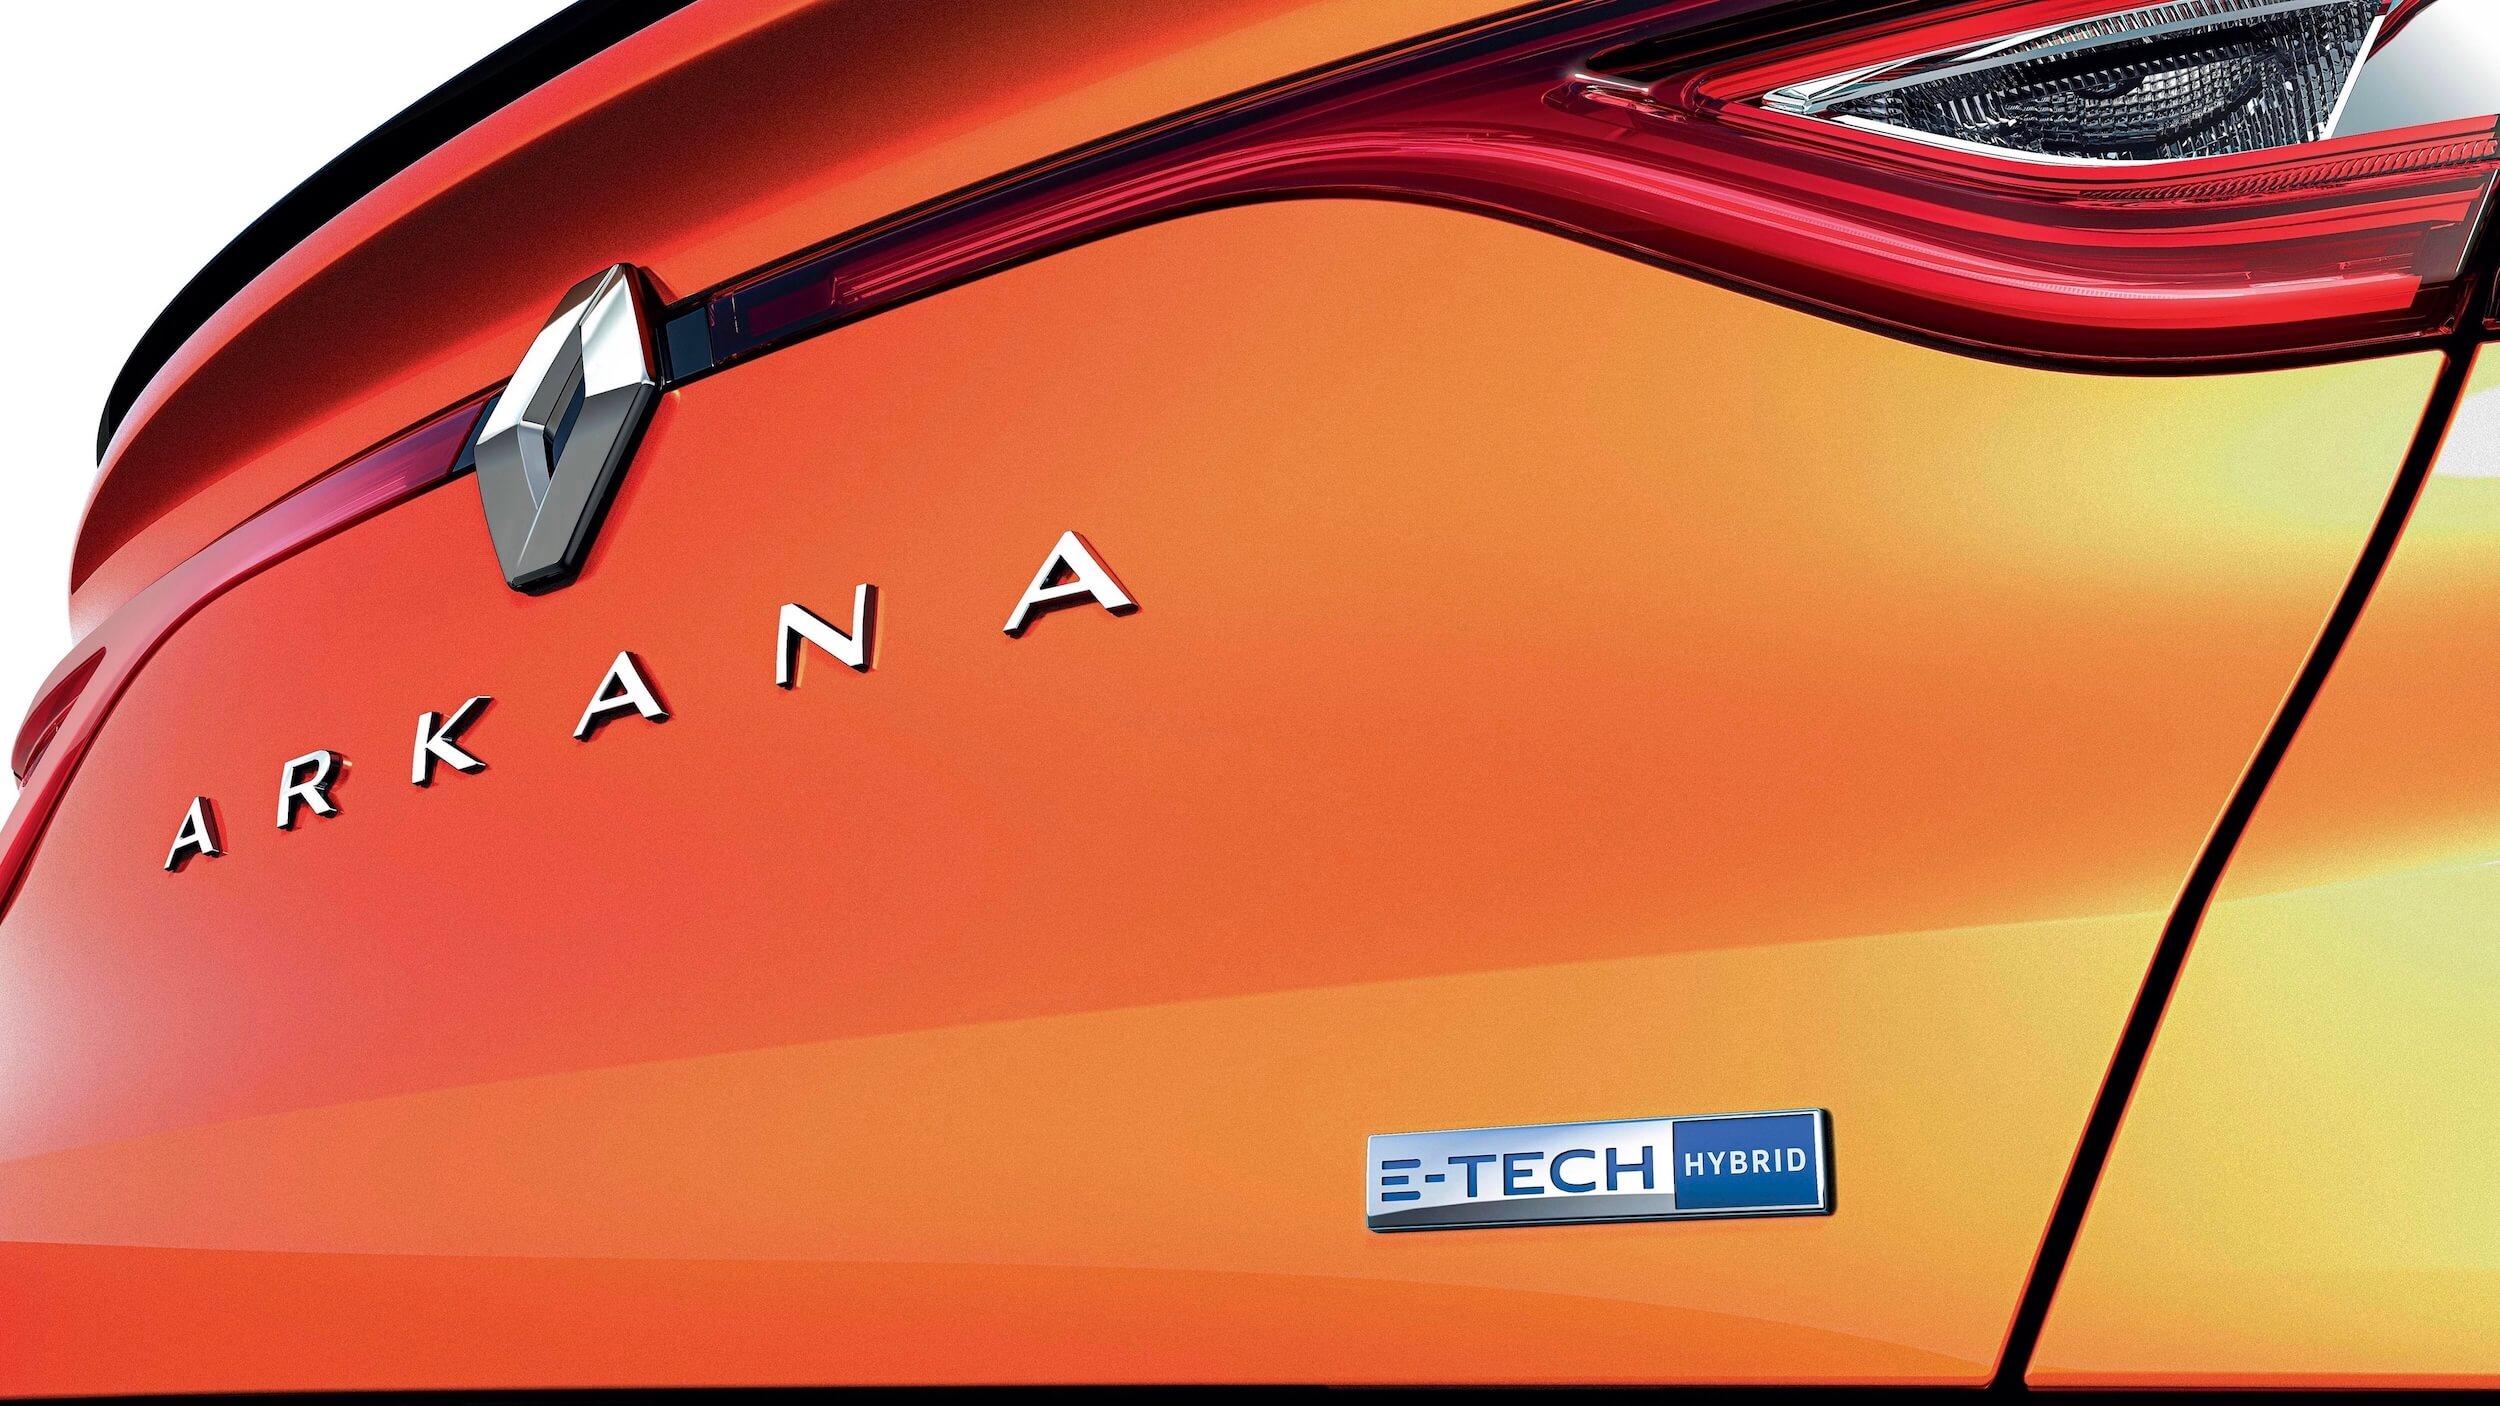 Renault Arkana Hybrid 5